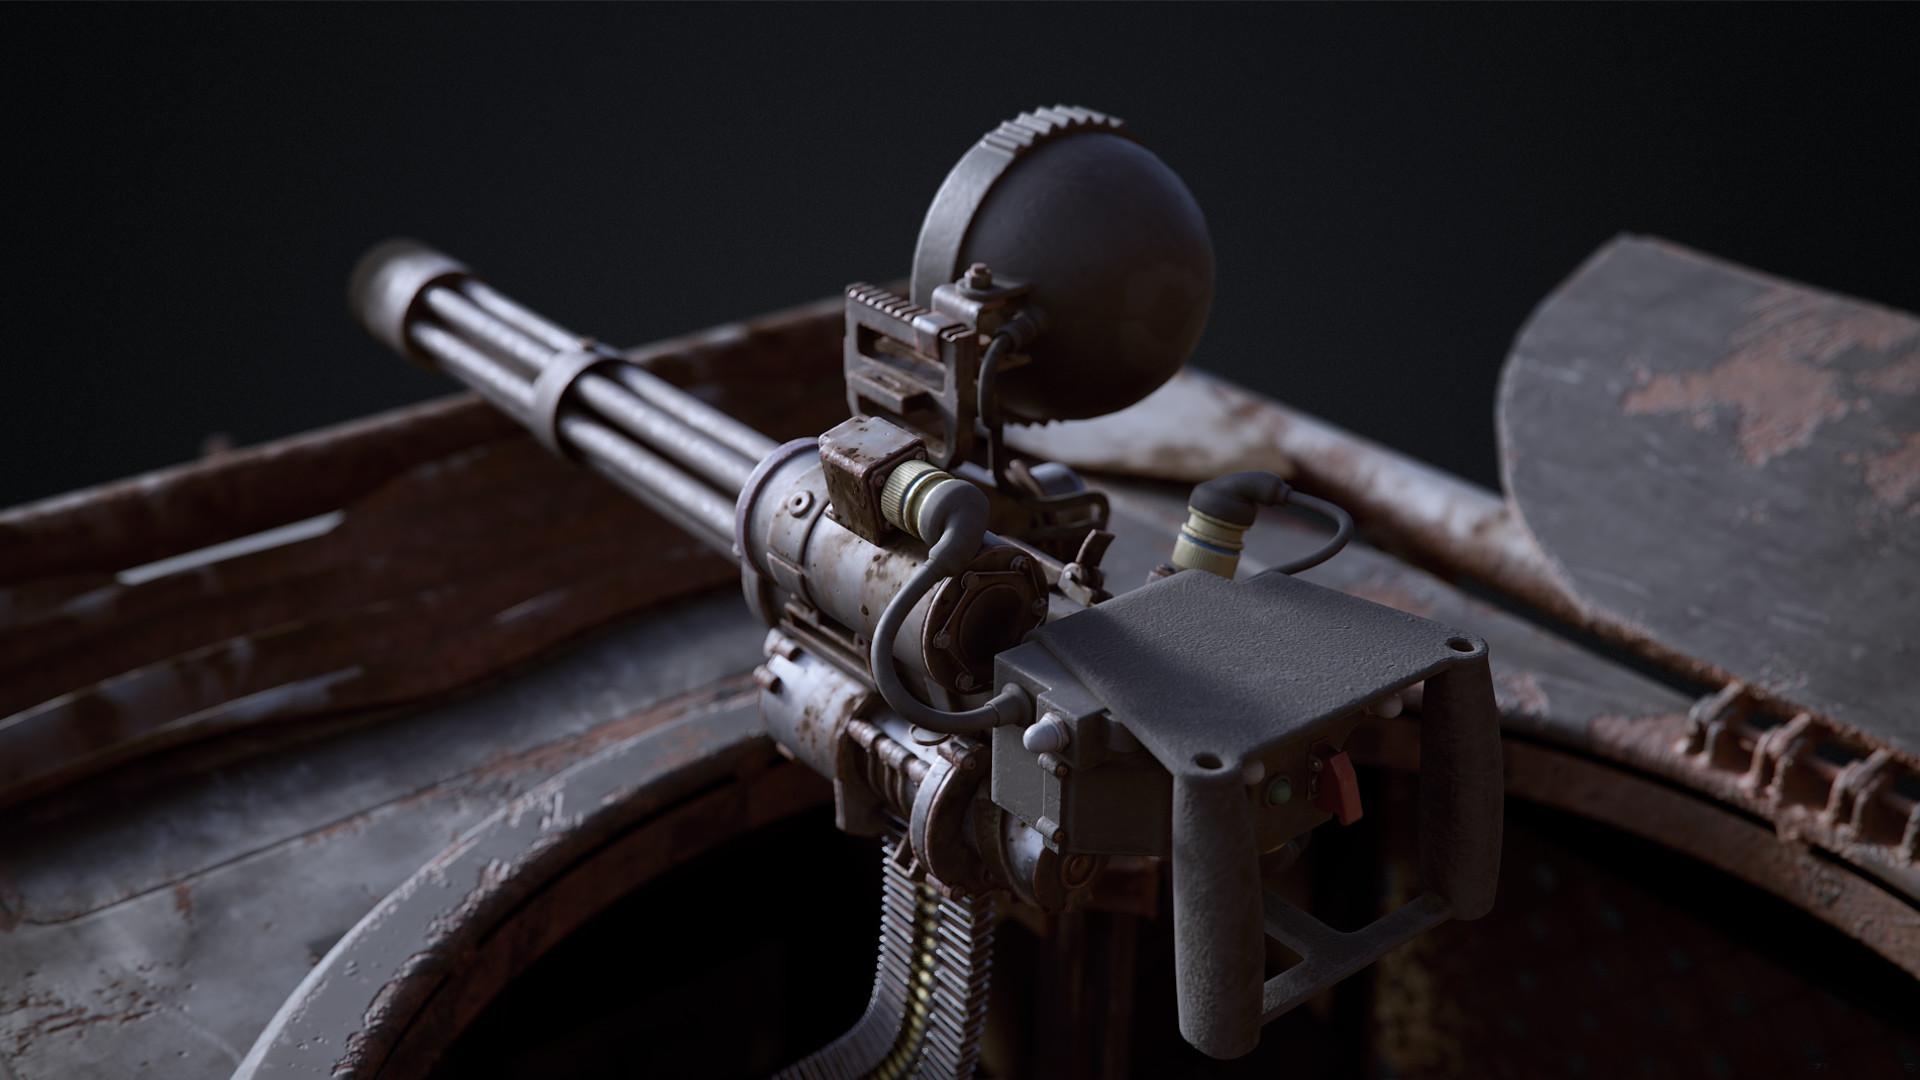 Moritz mayer gun1